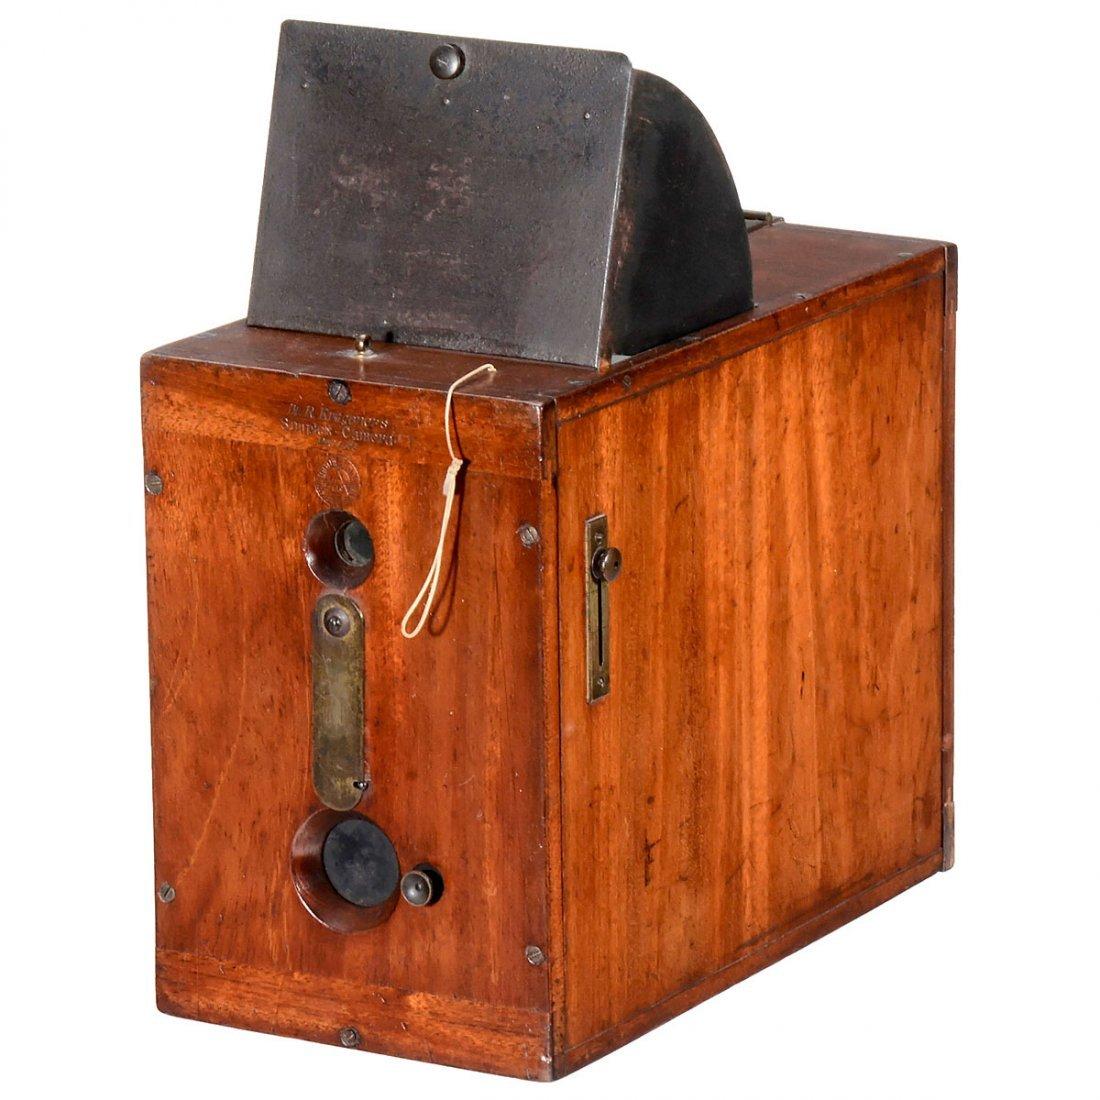 Dr Krügener's Simplex-Camera 9 x 12, c. 1889